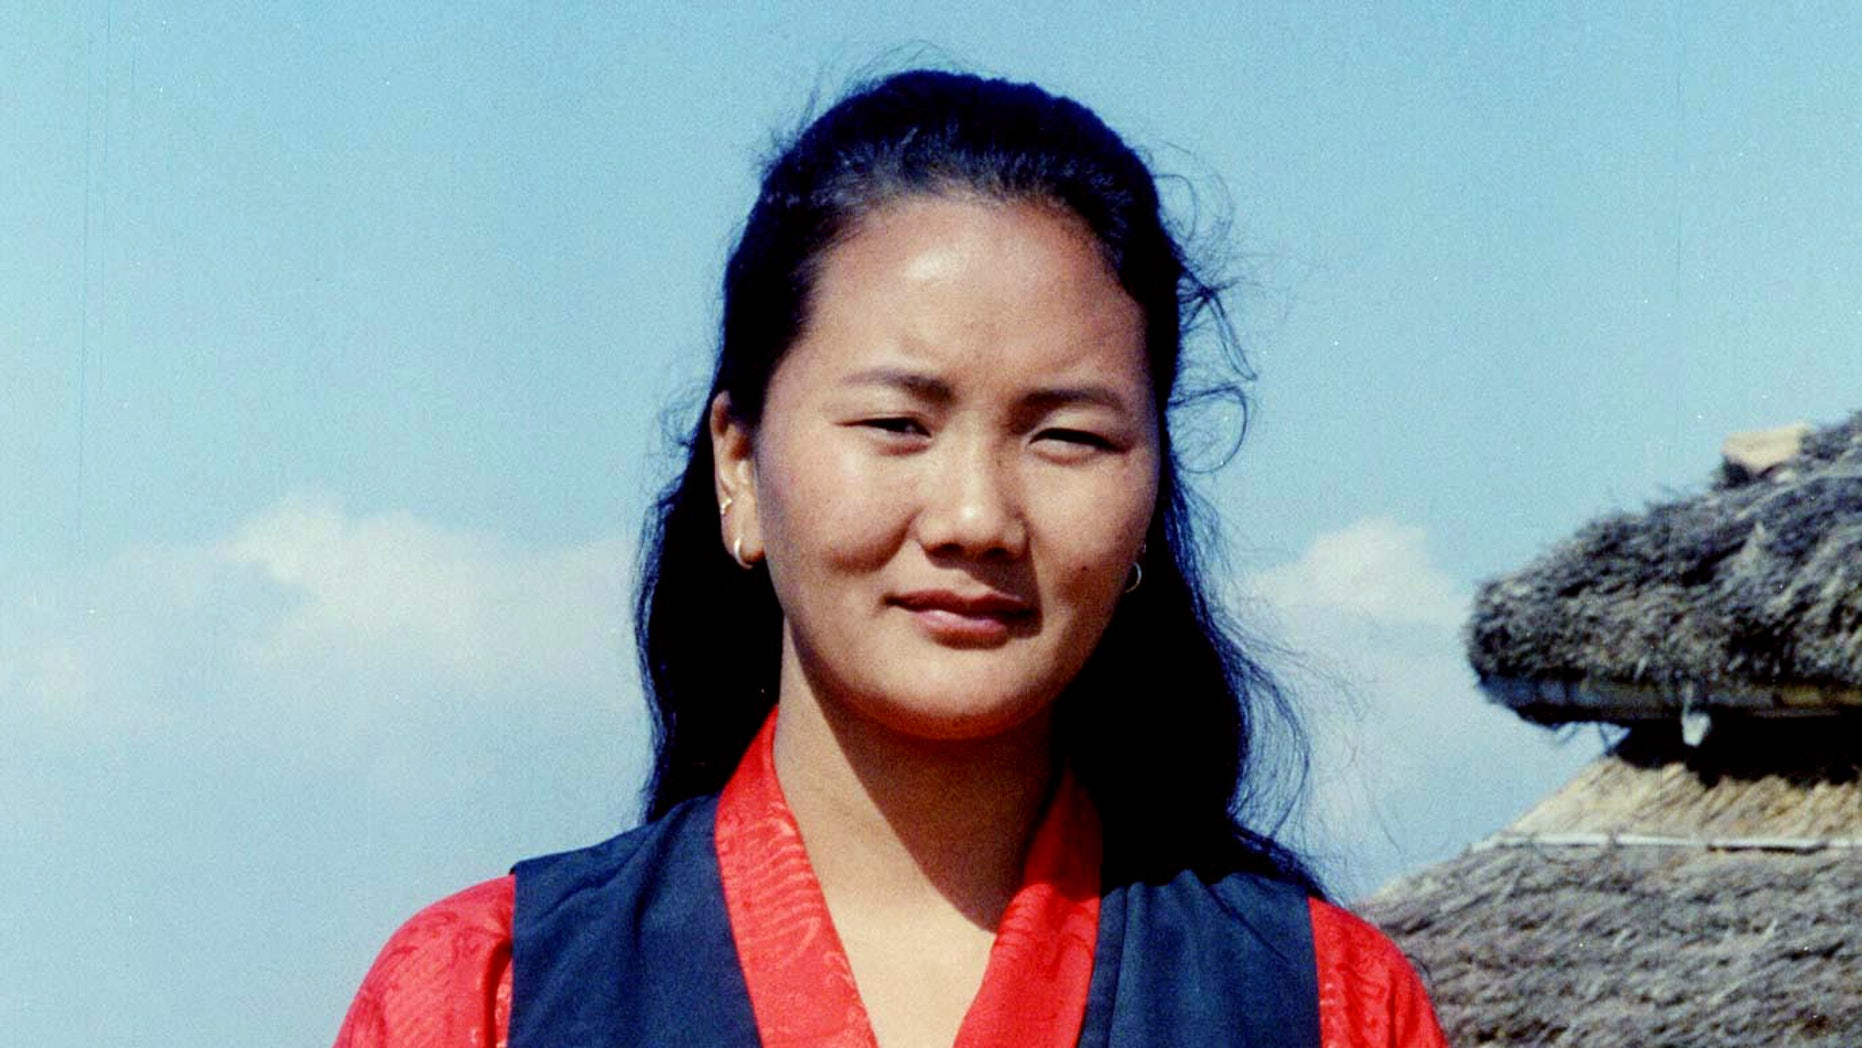 Lhakpa Sherpa, 27, is seen in Kathmandu in this May 2000 file photo.